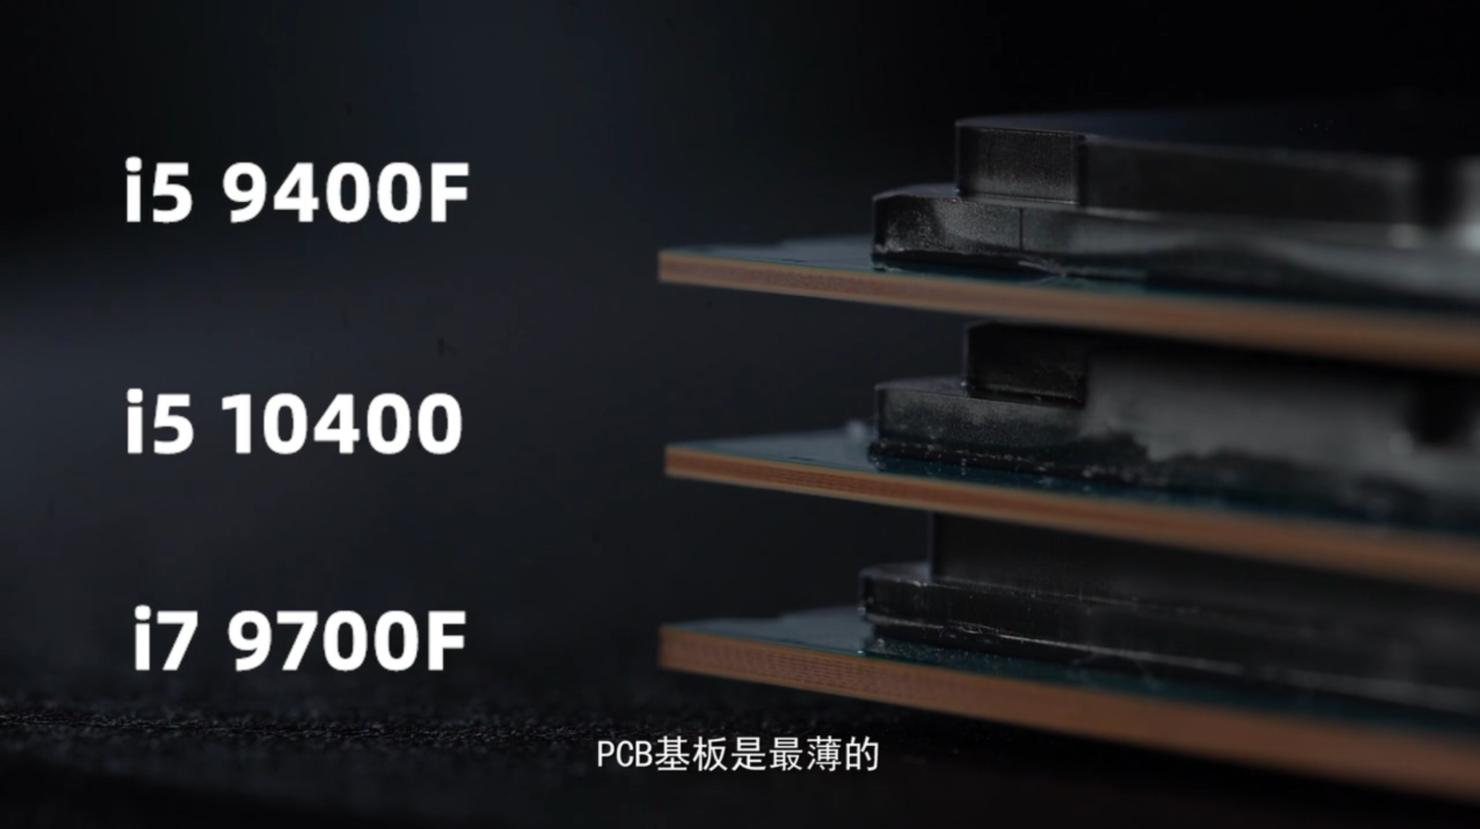 intel-core-i5-10400-comet-lake-s-6-core-desktop-cpu_pcb